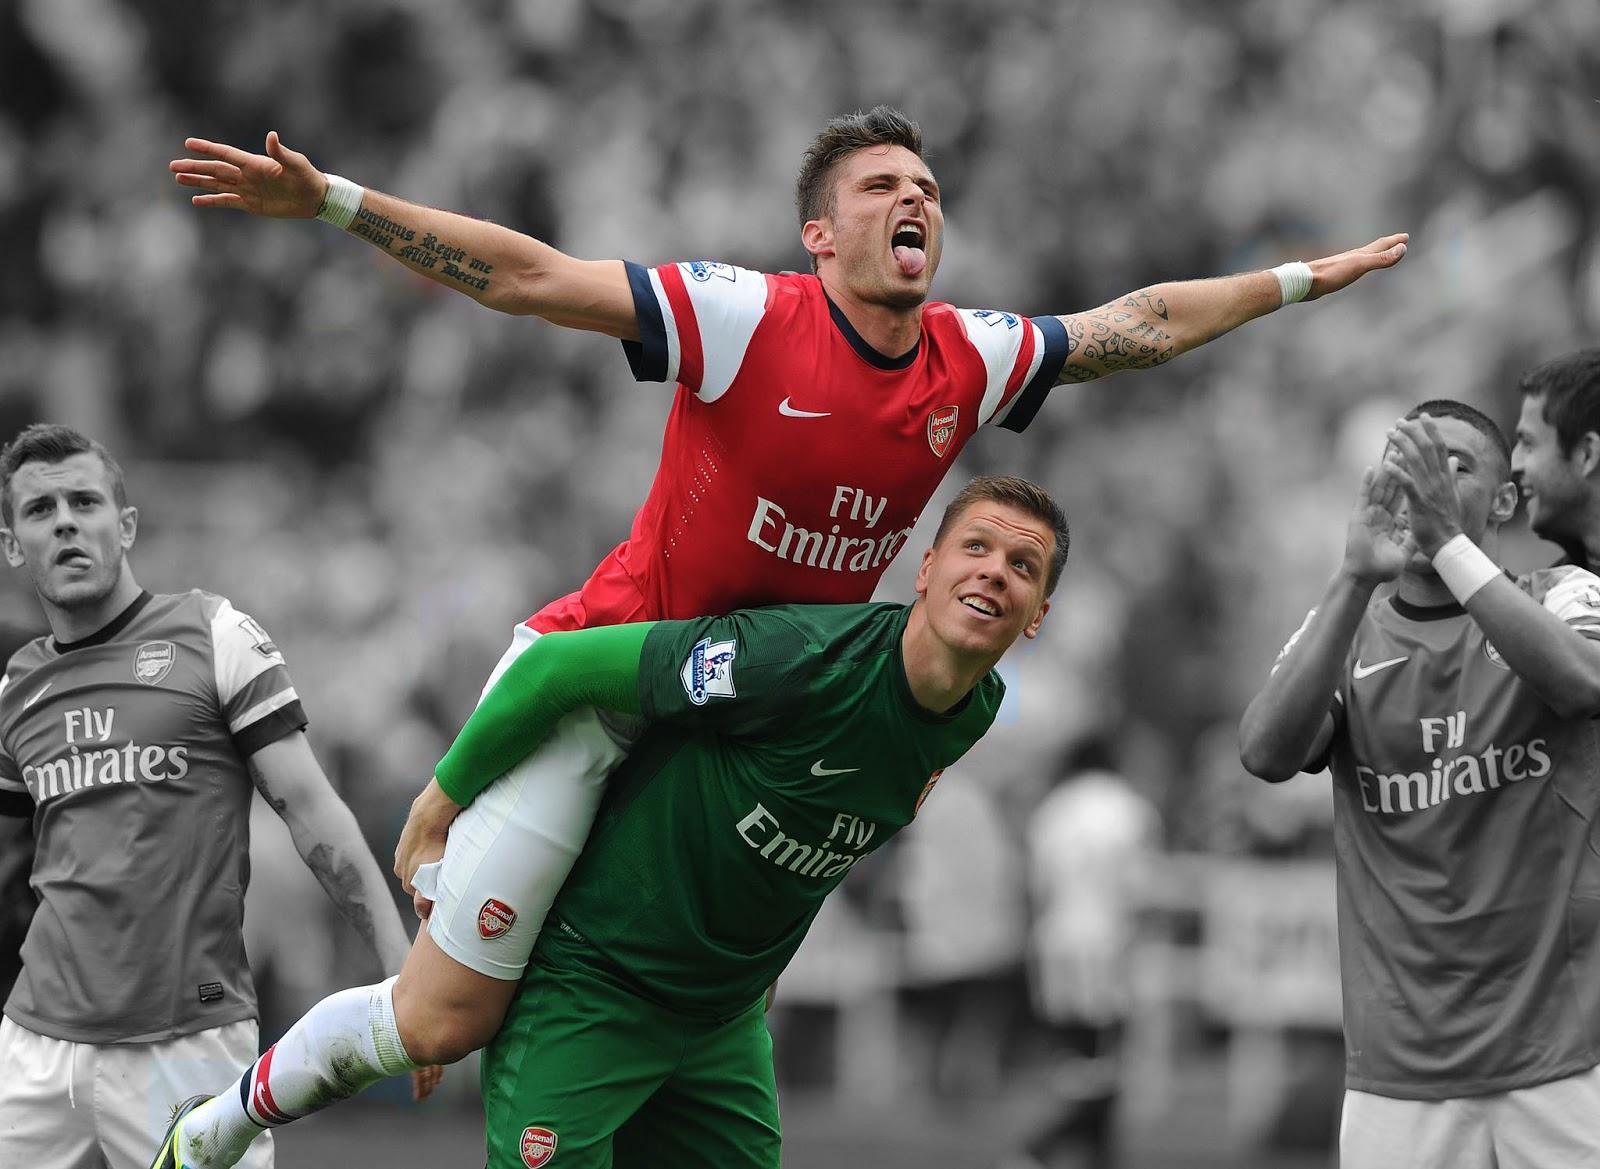 Arsenal Live Wallpaper Hd Latest Arsenal News